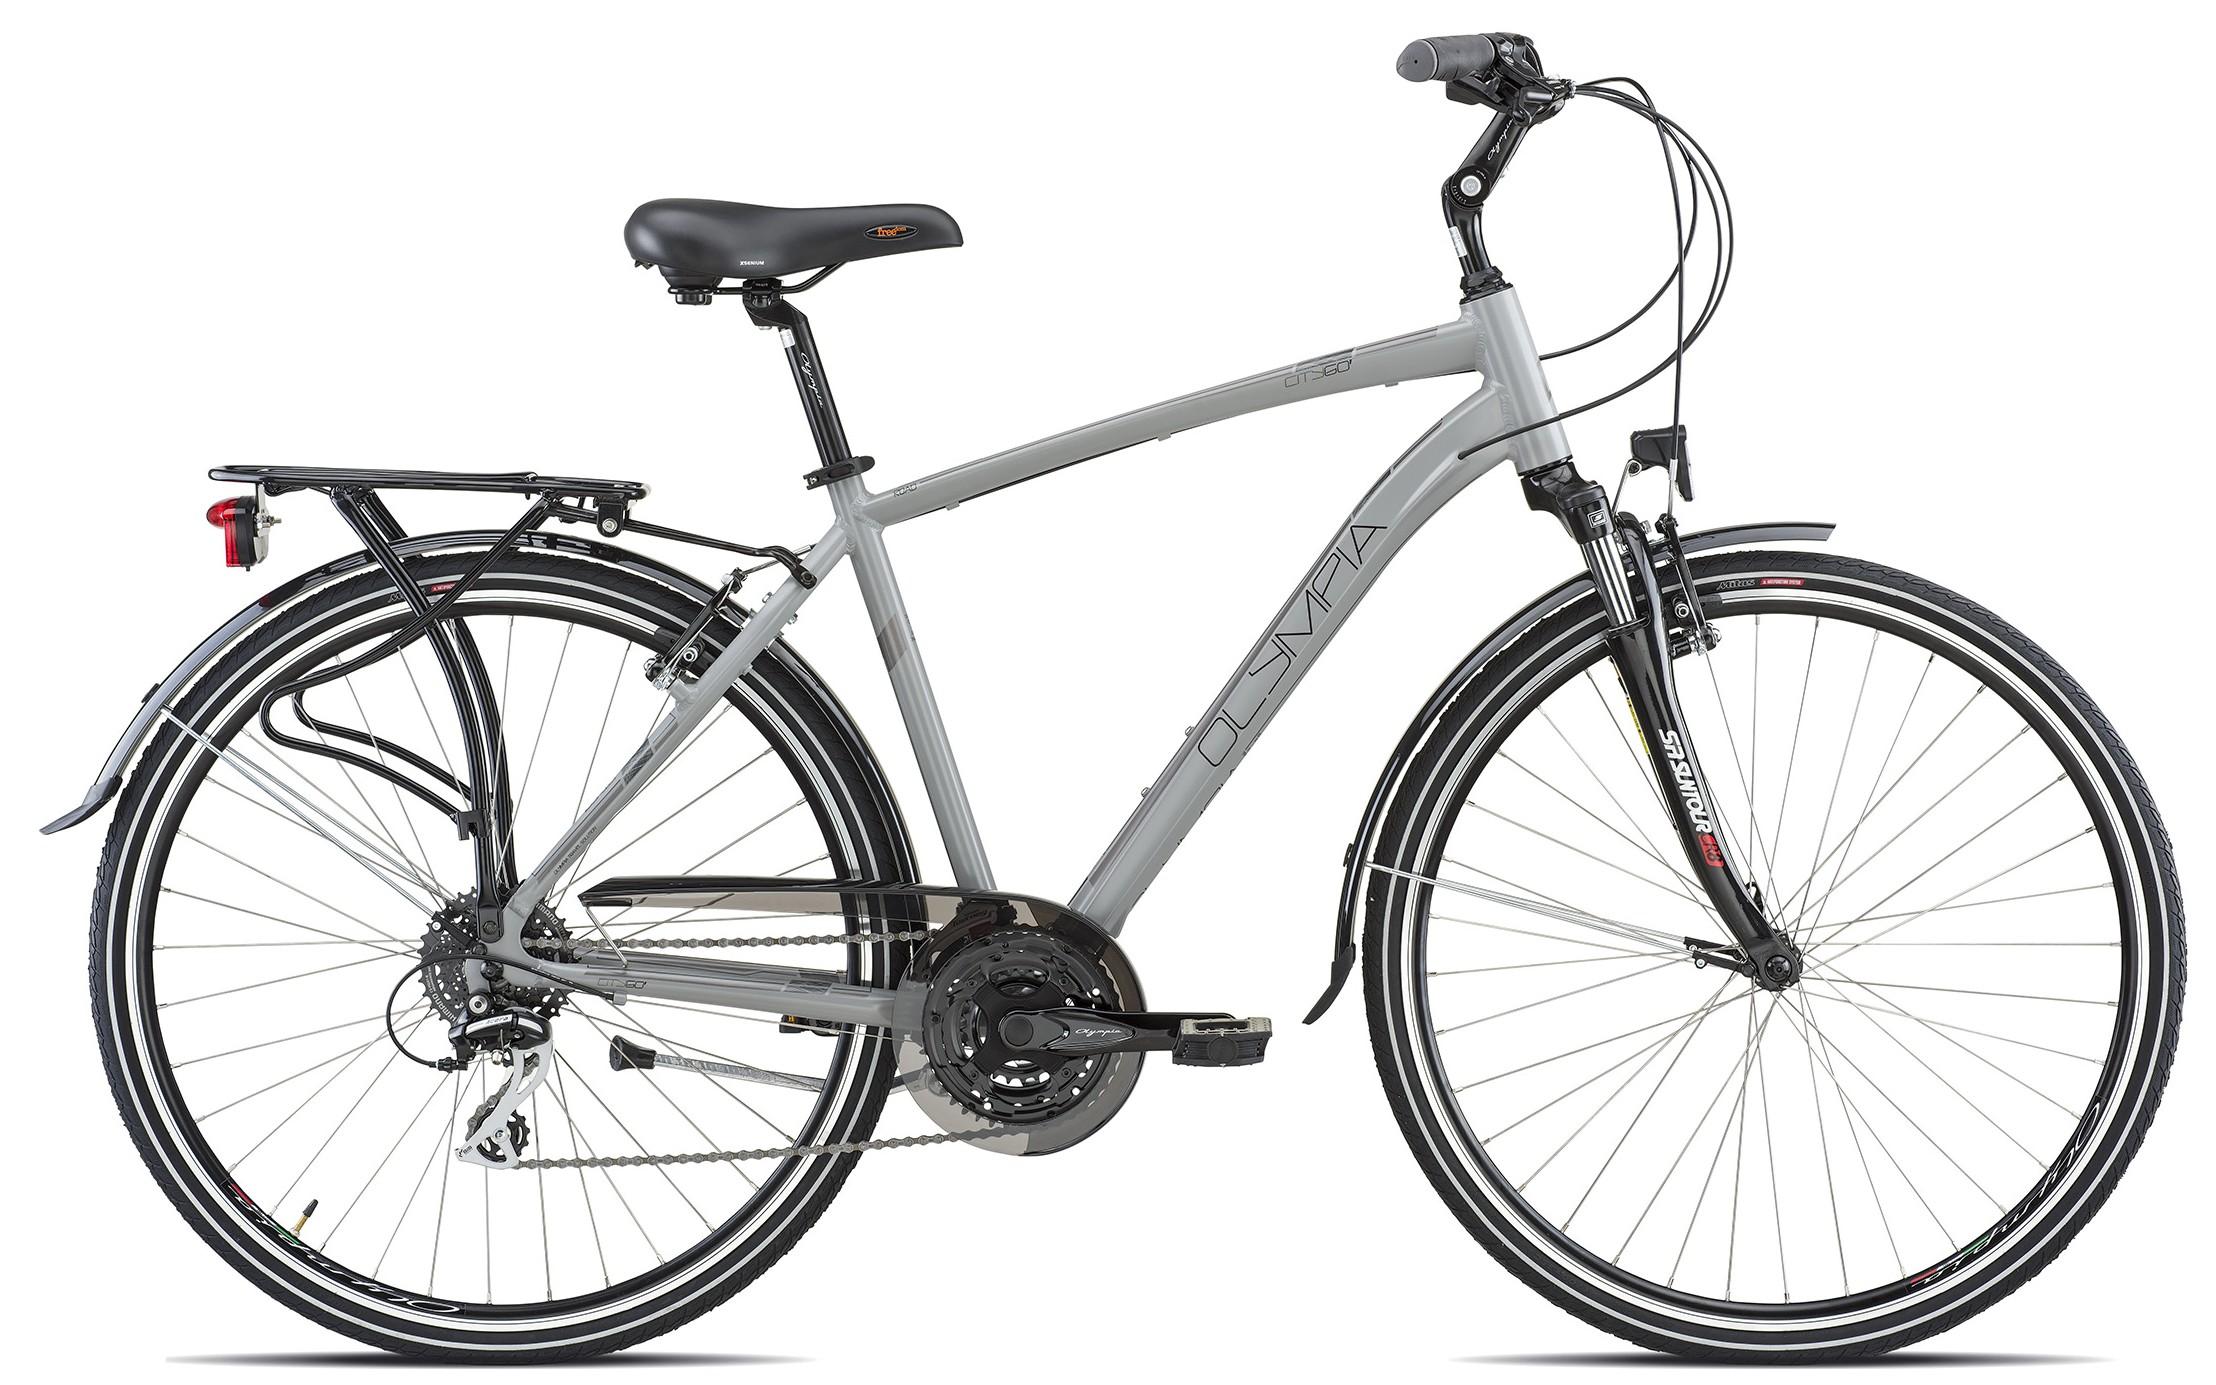 Bicicletta Olympia Trekking City Uomo Citygò 21v 2019